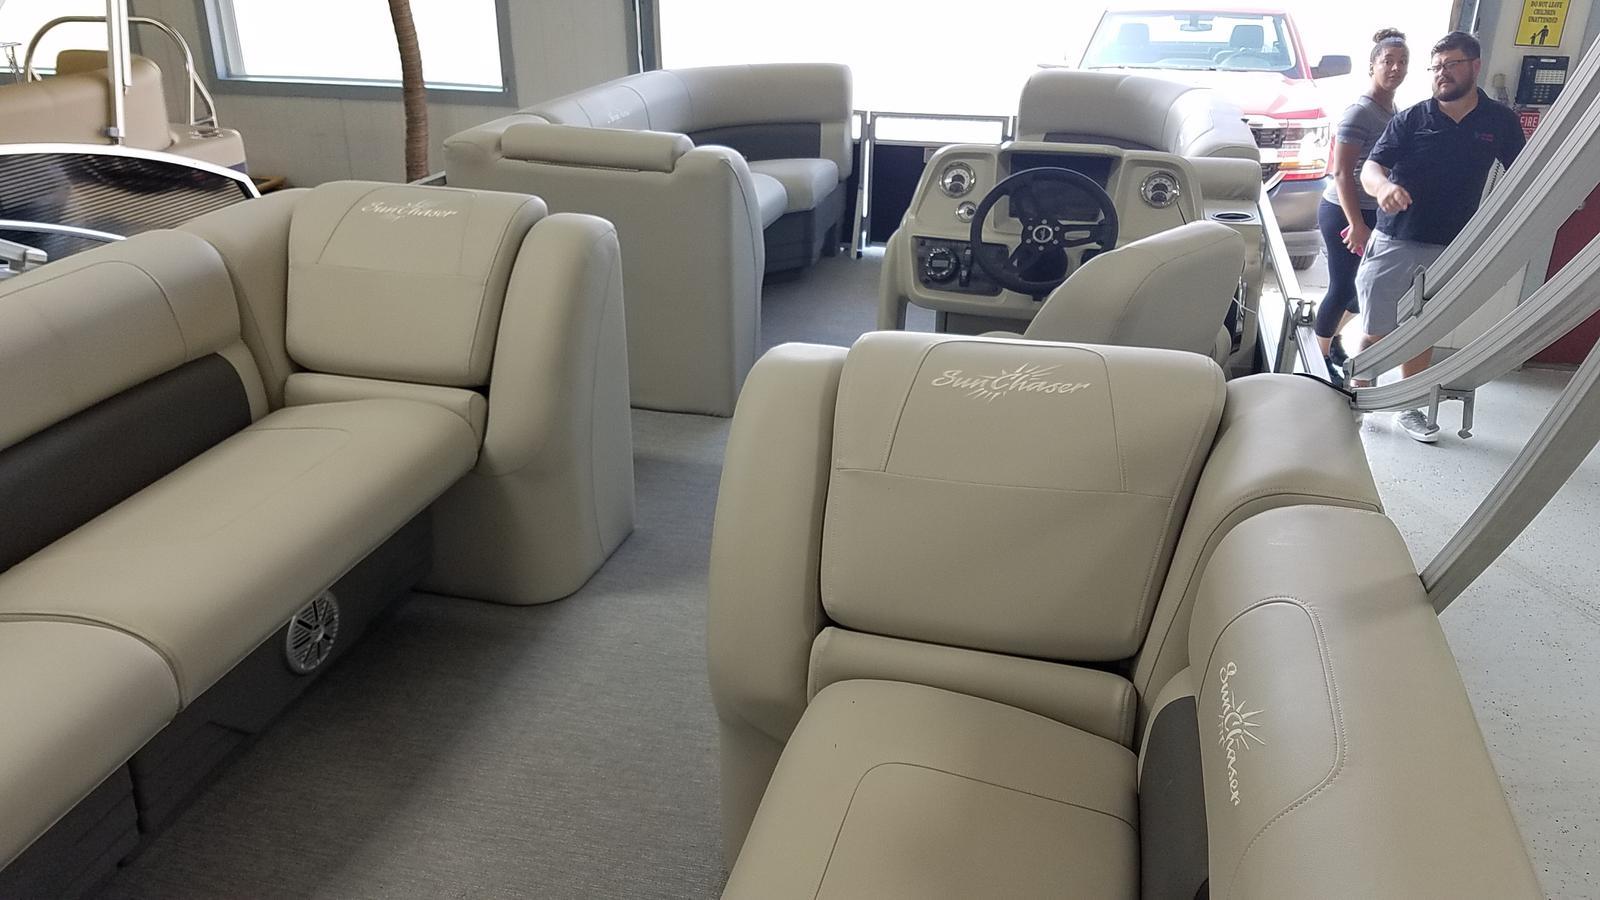 2021 SunChaser boat for sale, model of the boat is Vista 22 LR & Image # 4 of 7